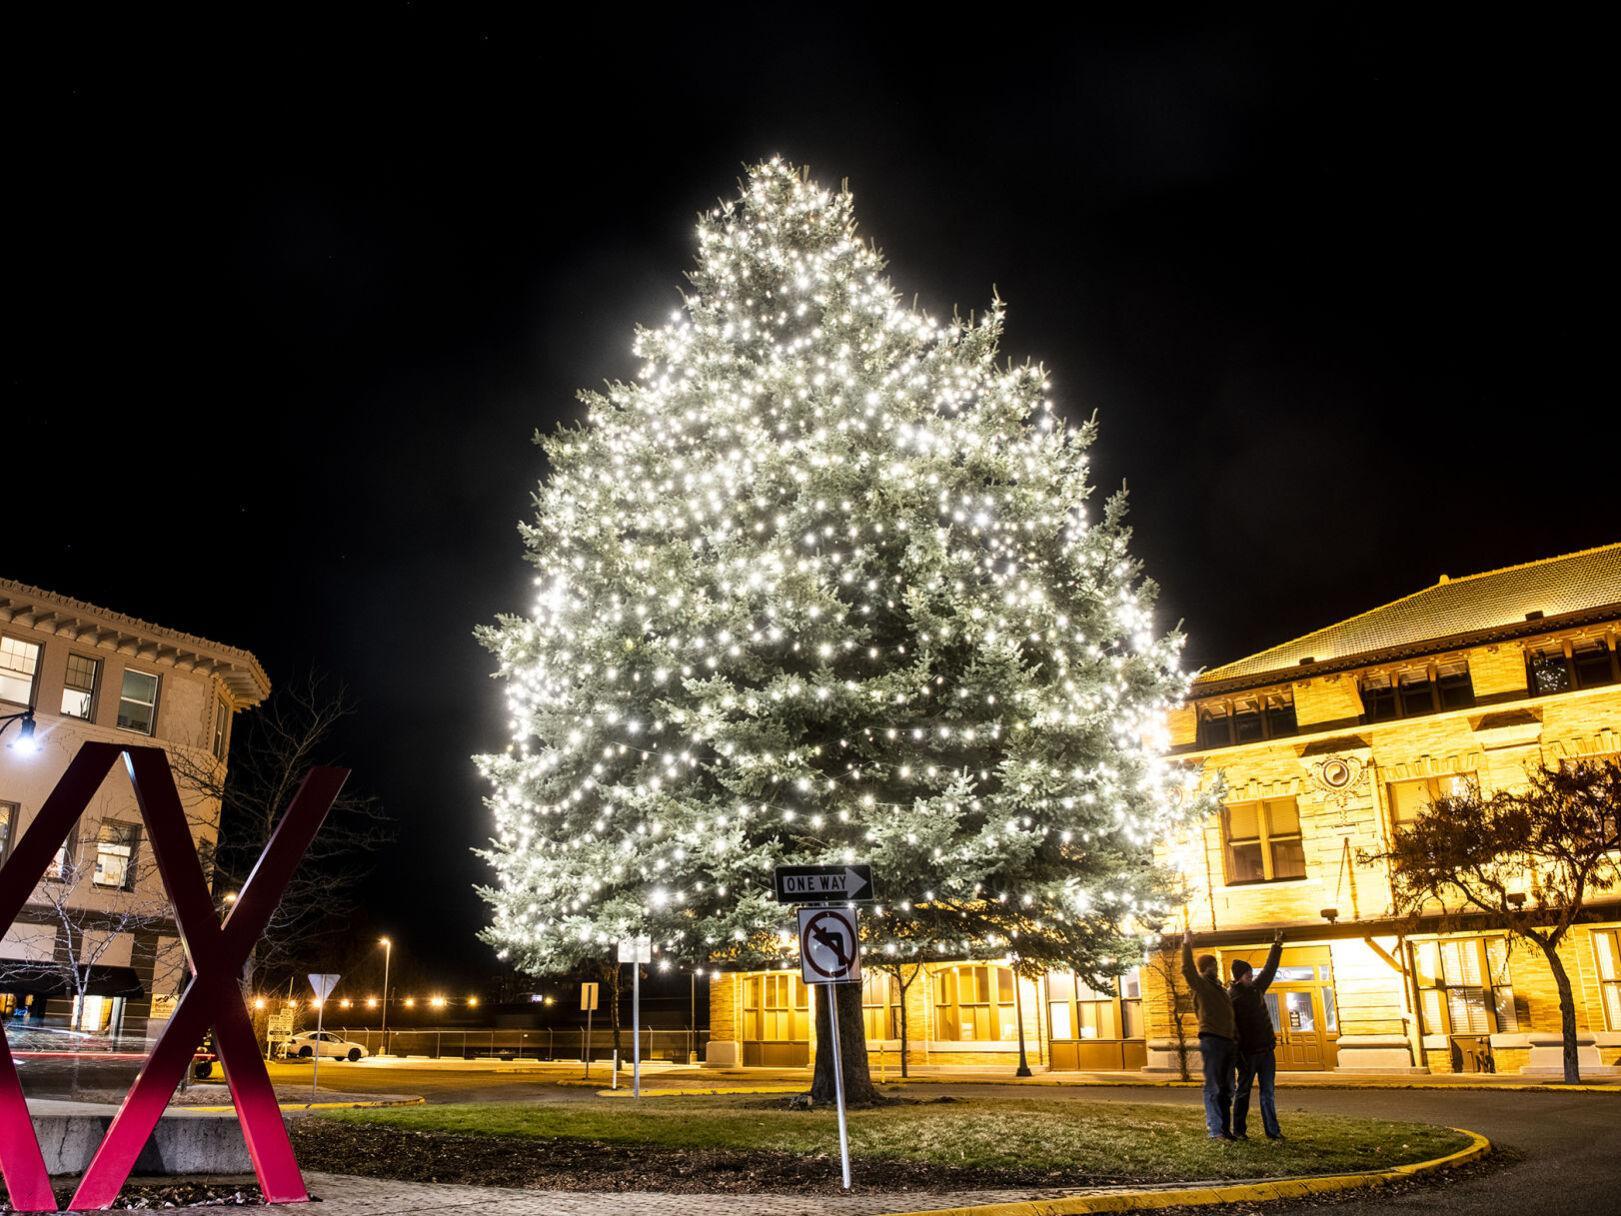 Christmas December Missoula 2021 Holidays Amid Covid 19 Missoula Celebrations Look Different Than Years Past Local News Missoulian Com